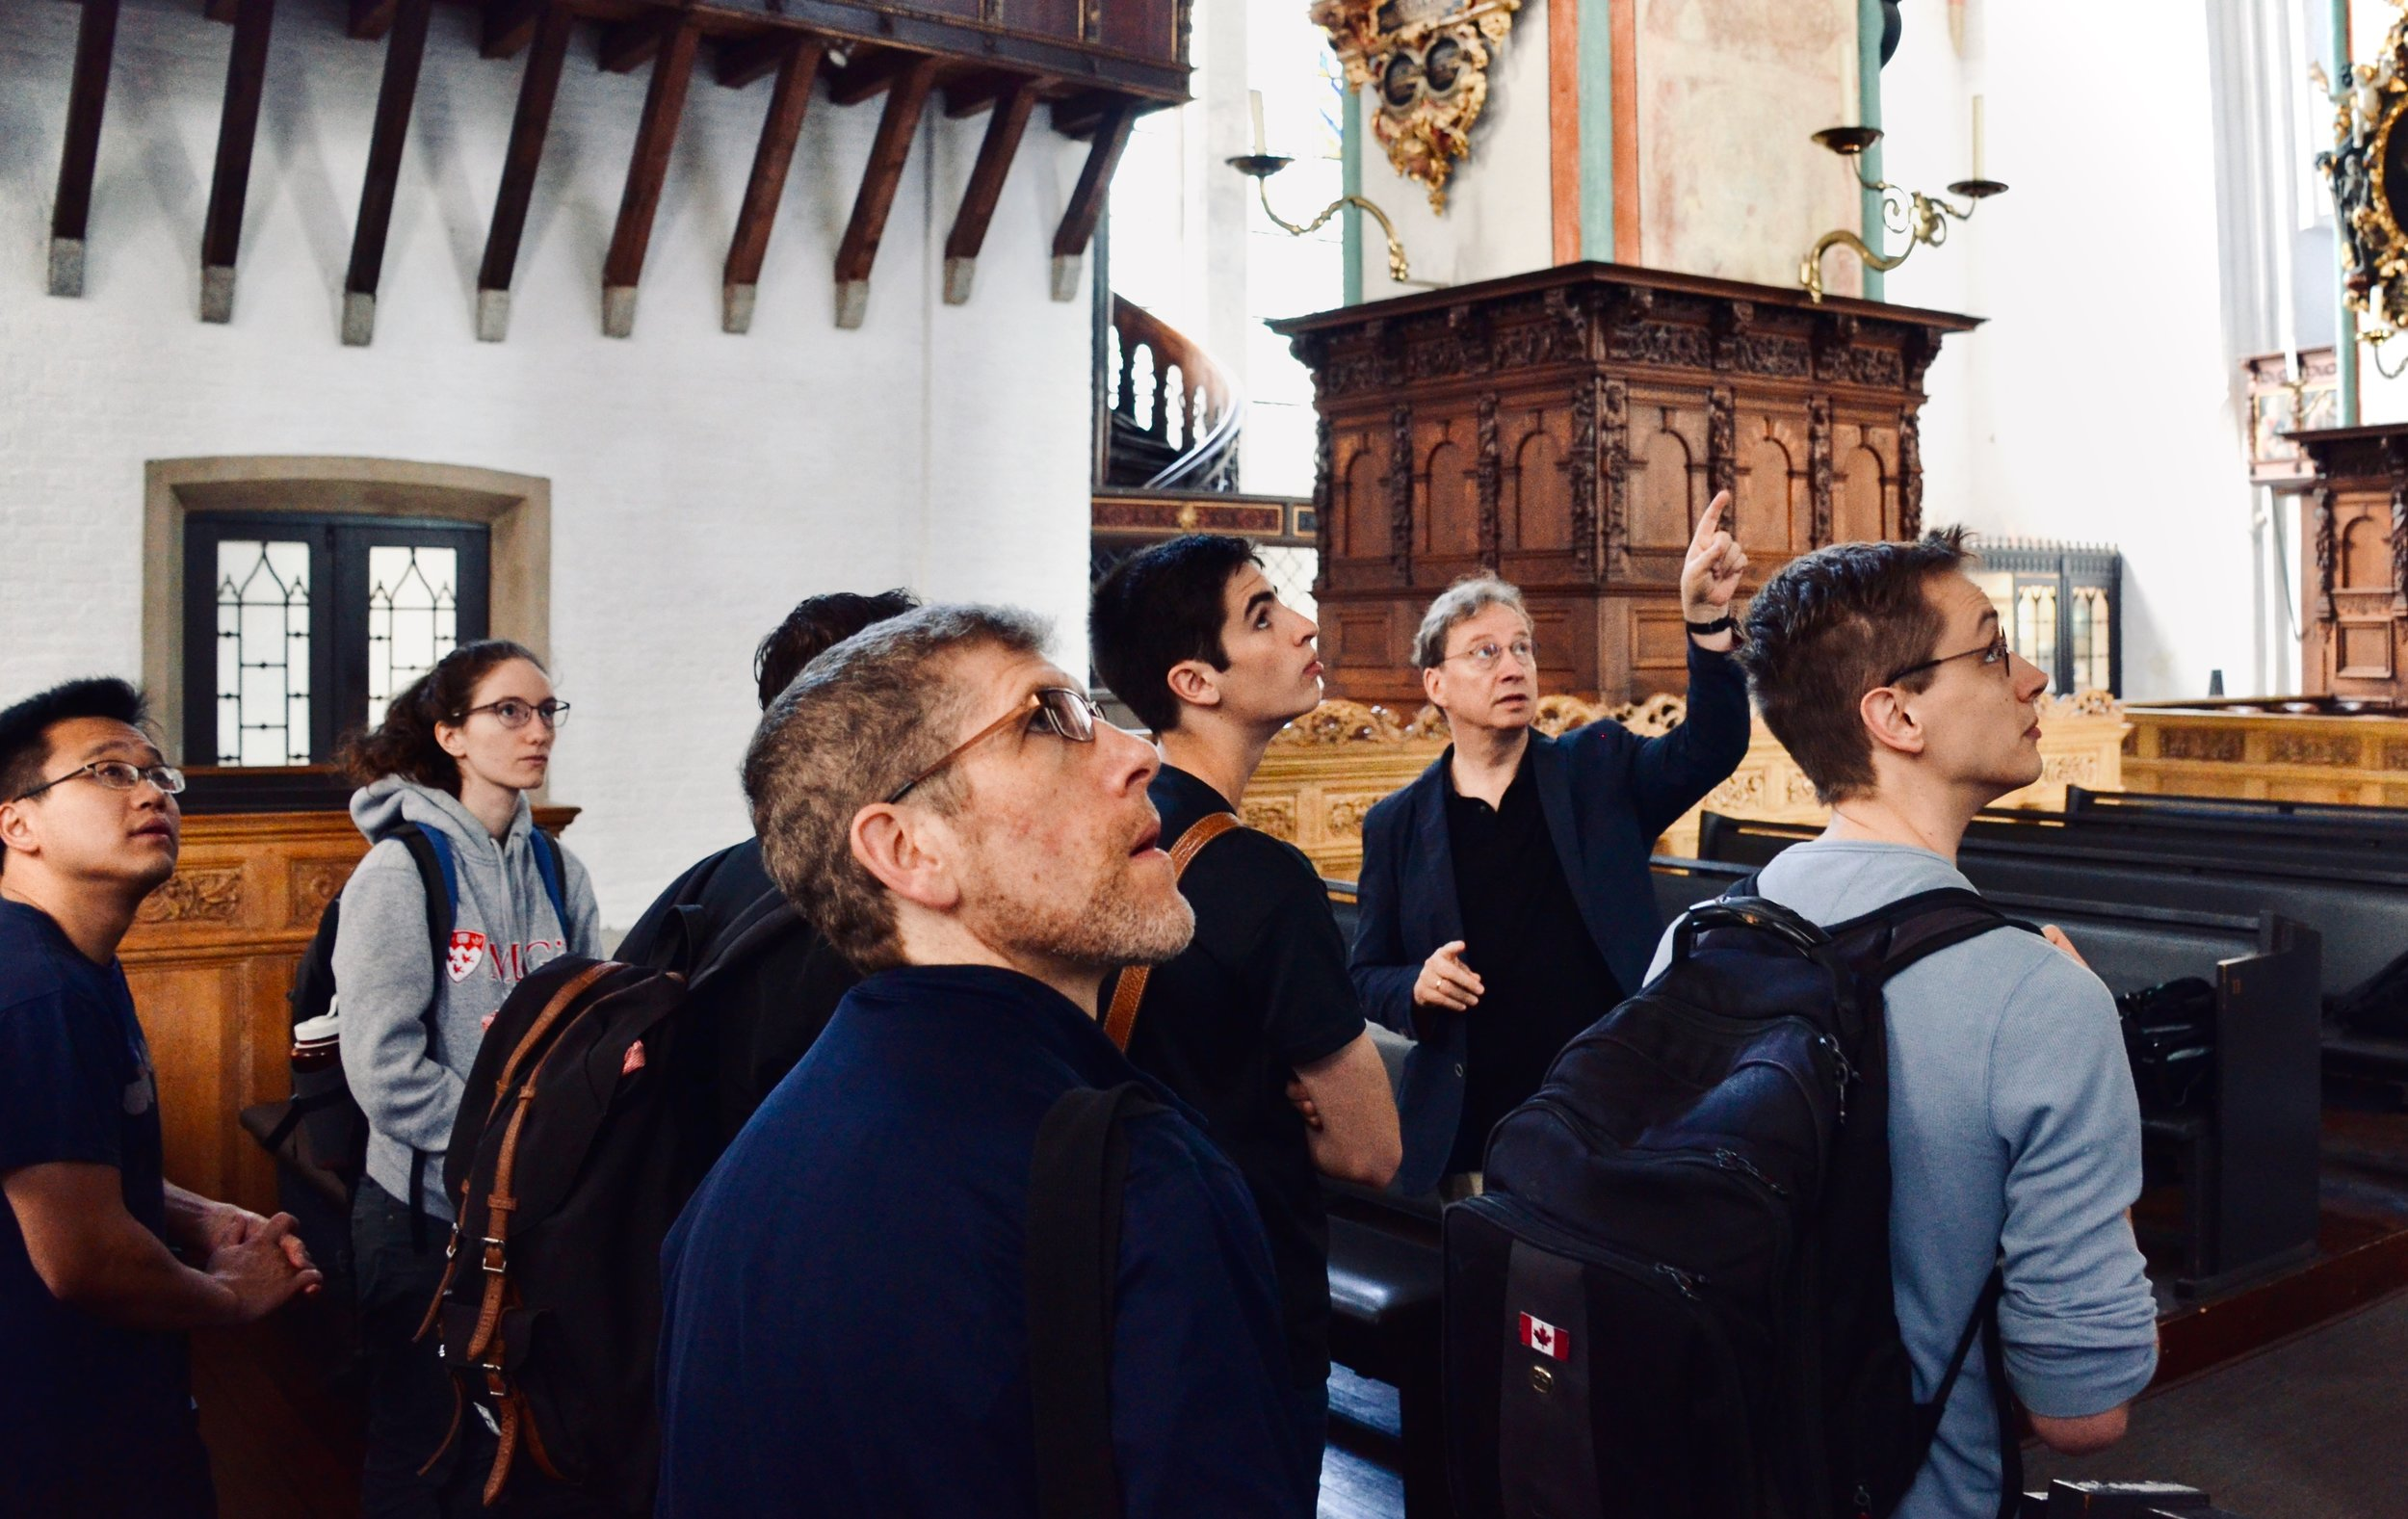 Prof. Arvid Gast introduces the organs in St. Jakobi, Lübeck.